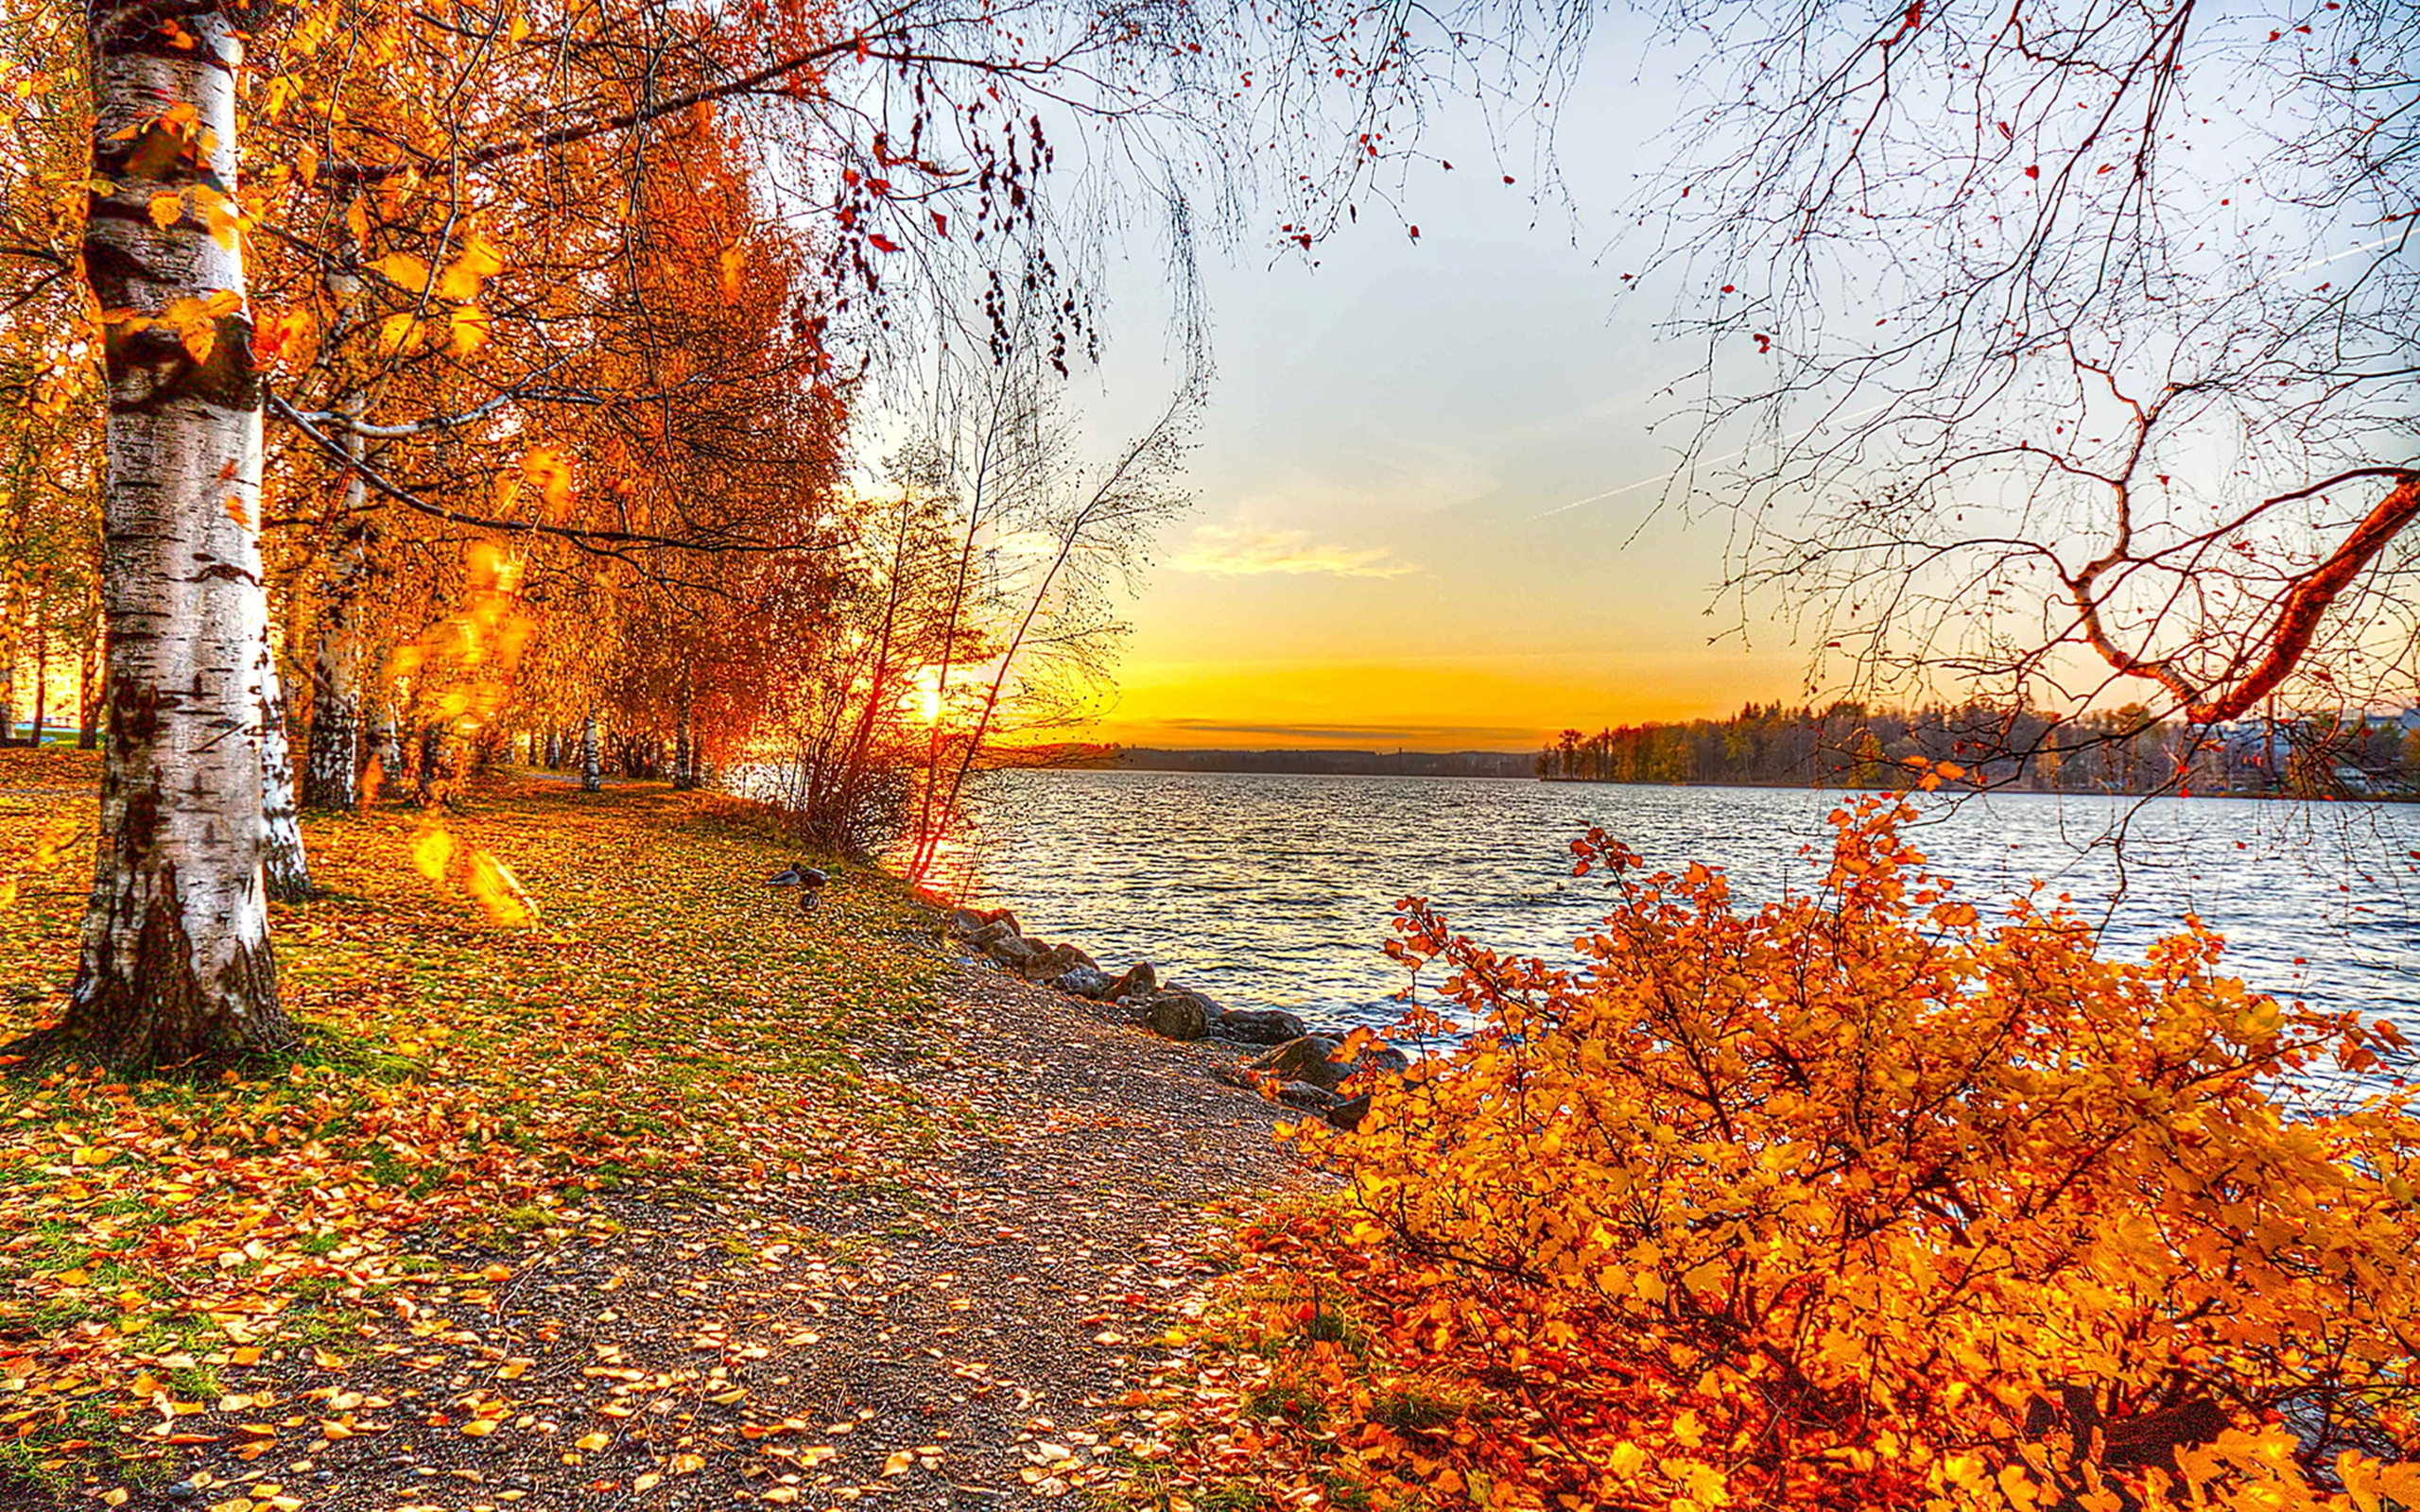 Autumn Lake Sunset 604132 : Wallpapers13.com